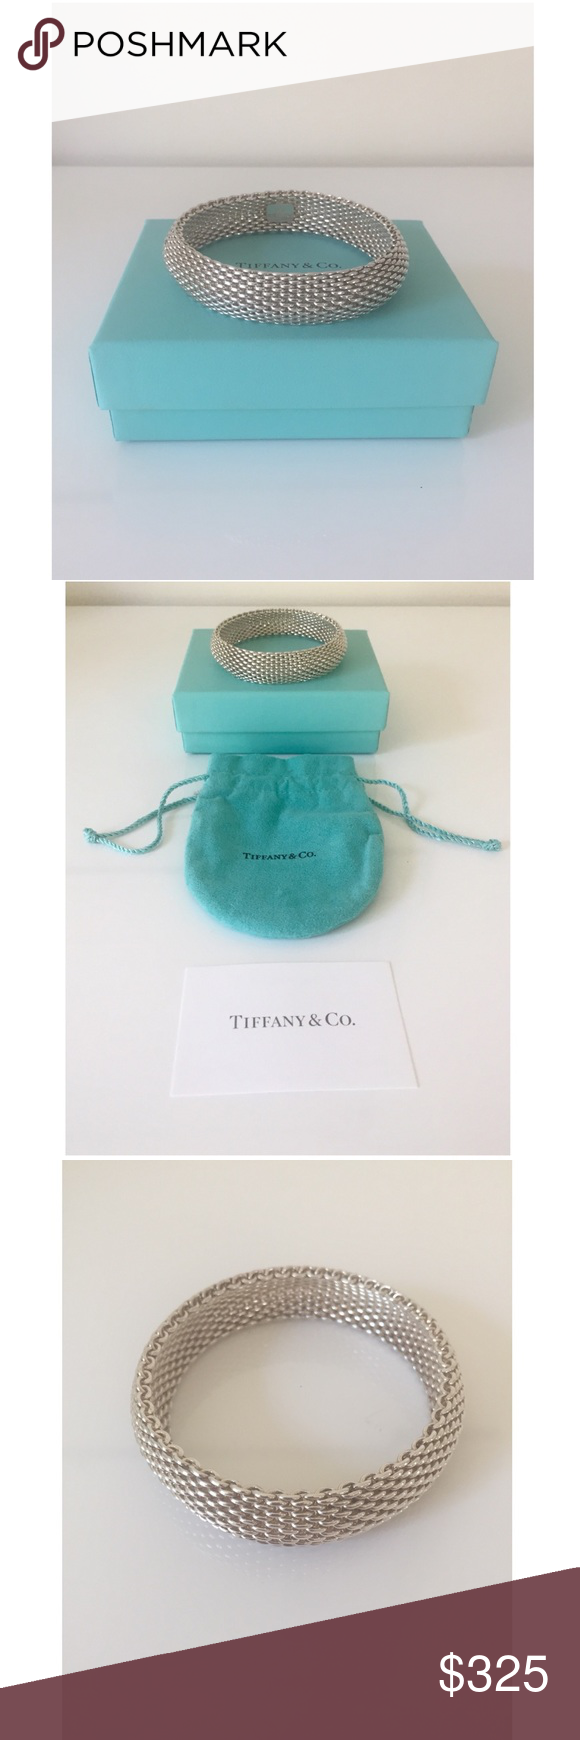 "5f99609fd TIFFANY & Co. Somerset 925 Silver 15mm Bangle 7.5"" Lovely Tiffany ..."